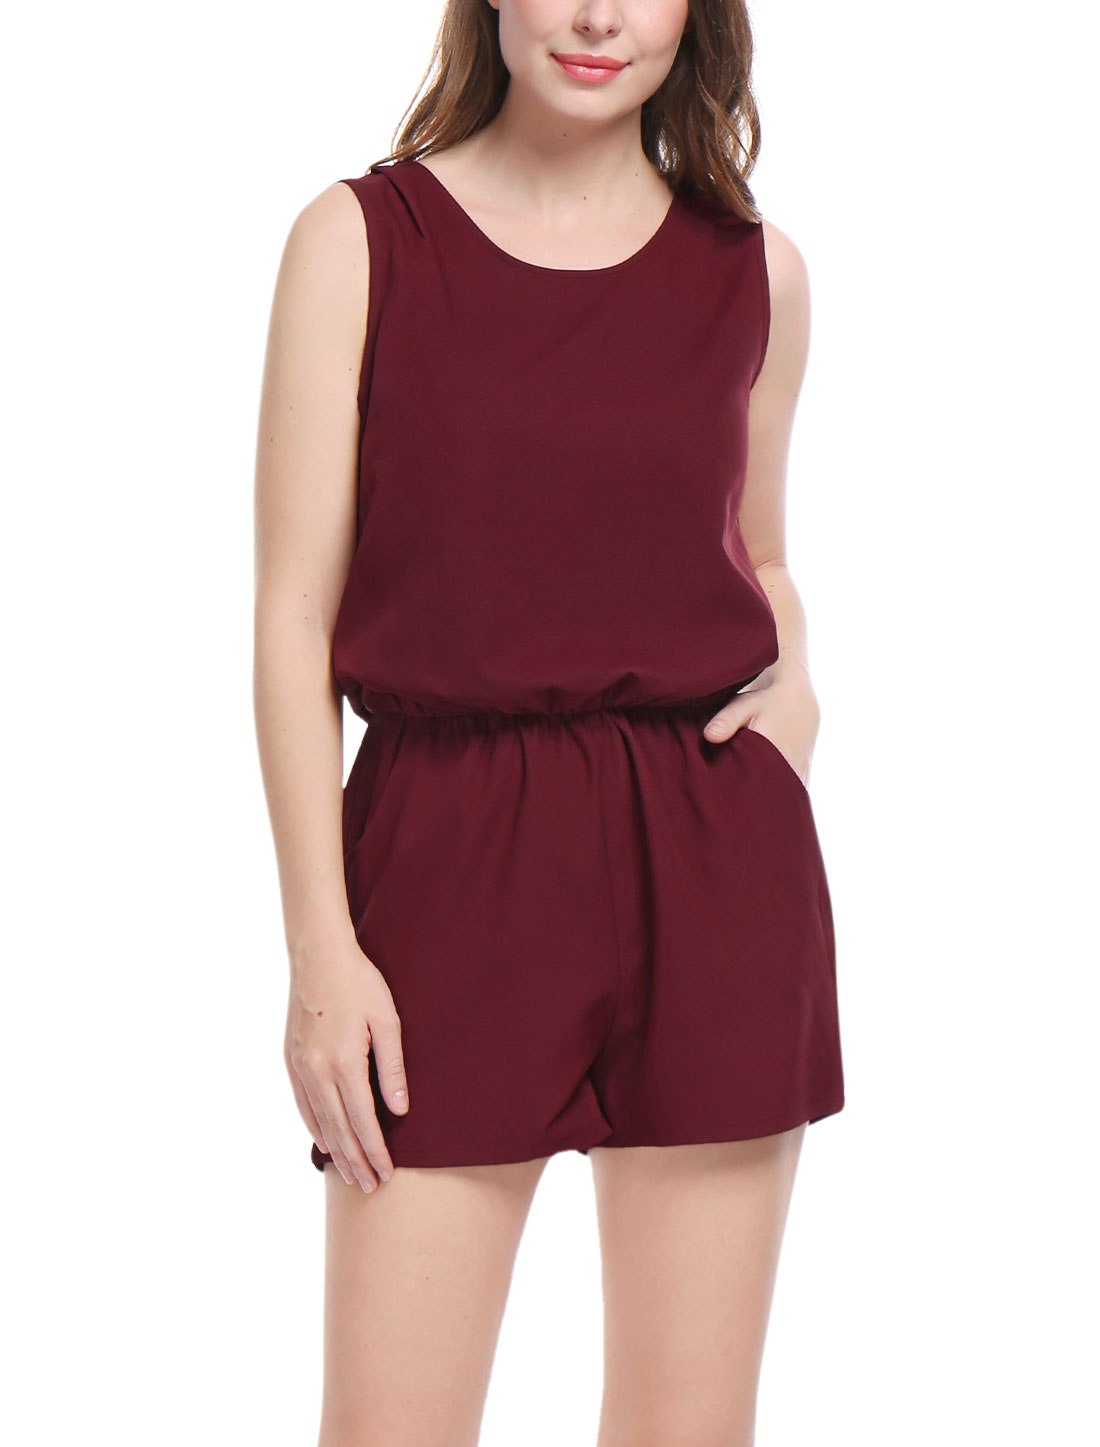 Women Sleeveless Cut Out Back Elastic Waist Romper Burgundy XL